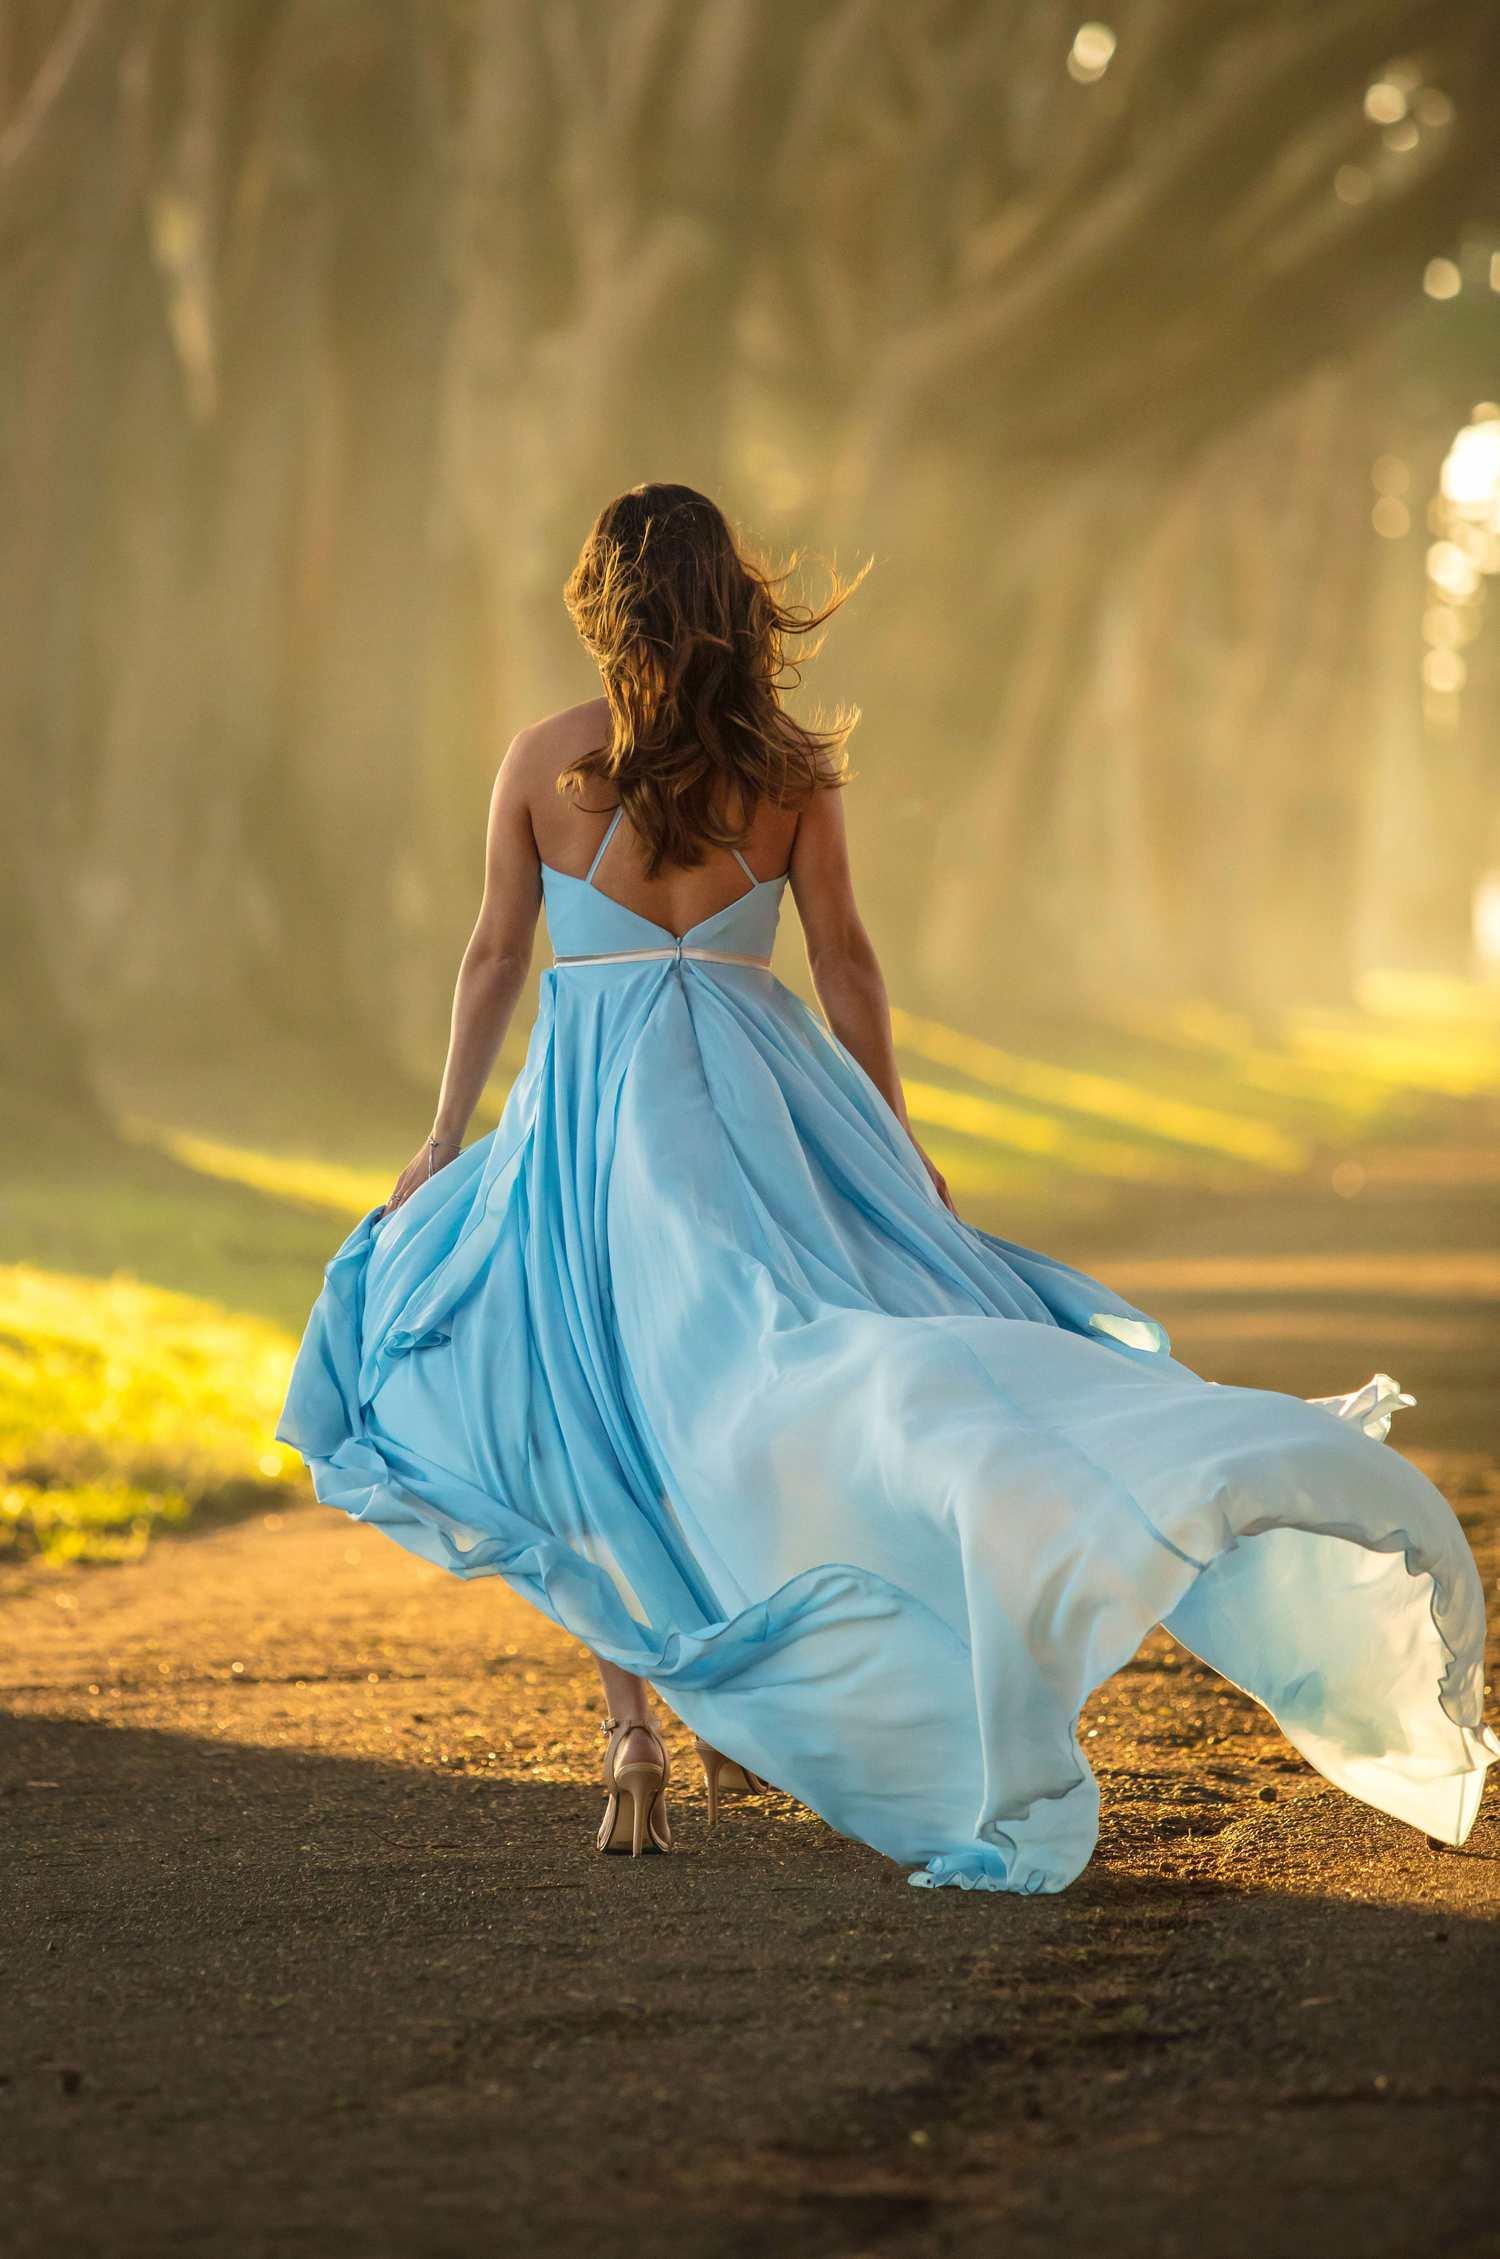 Mujer con vestido claro